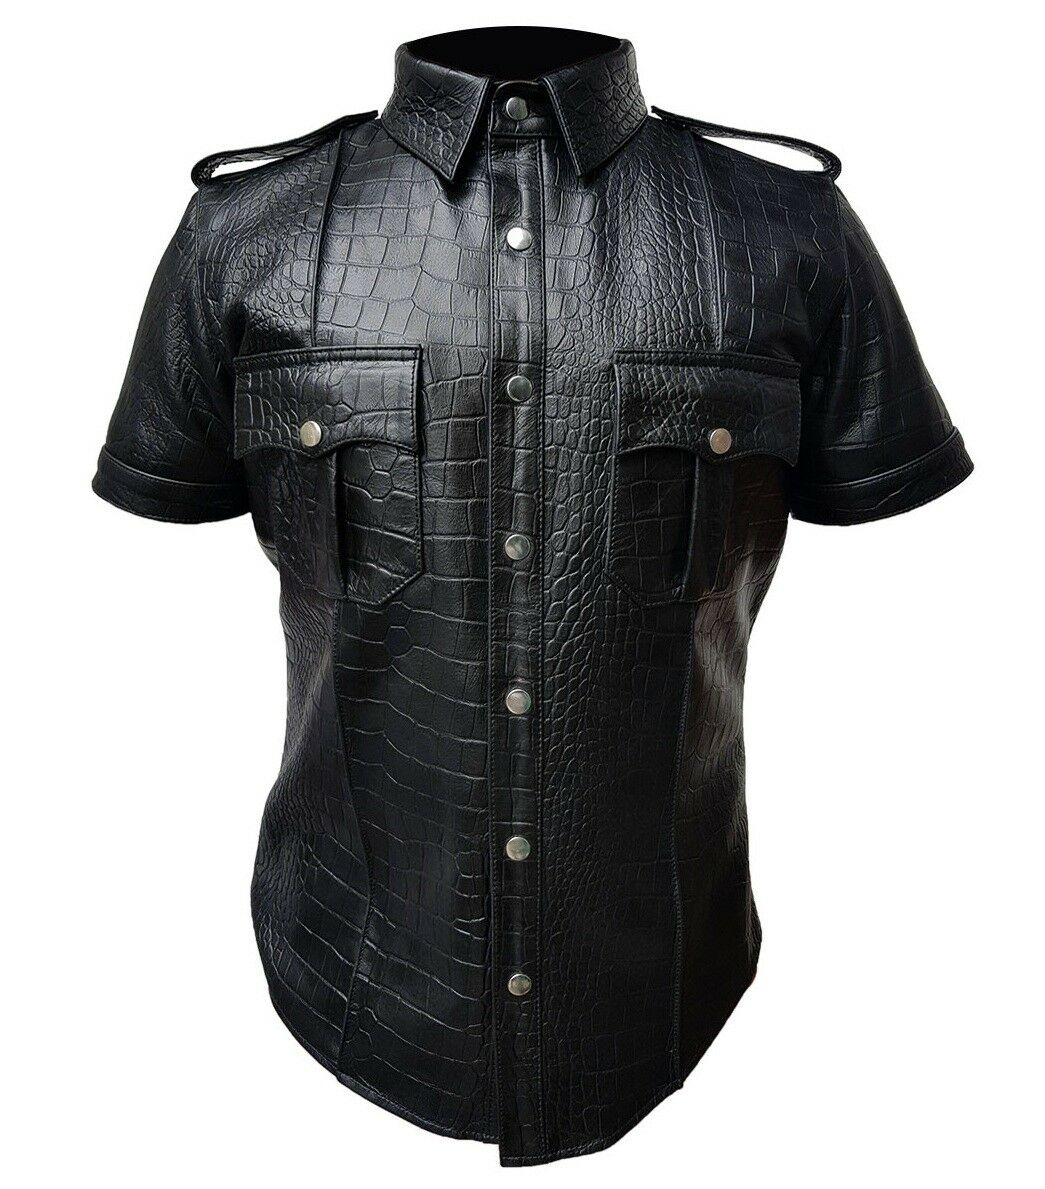 Mens Police Shirt Uniform Alligator Crocodile Print Leather Shirt blueF